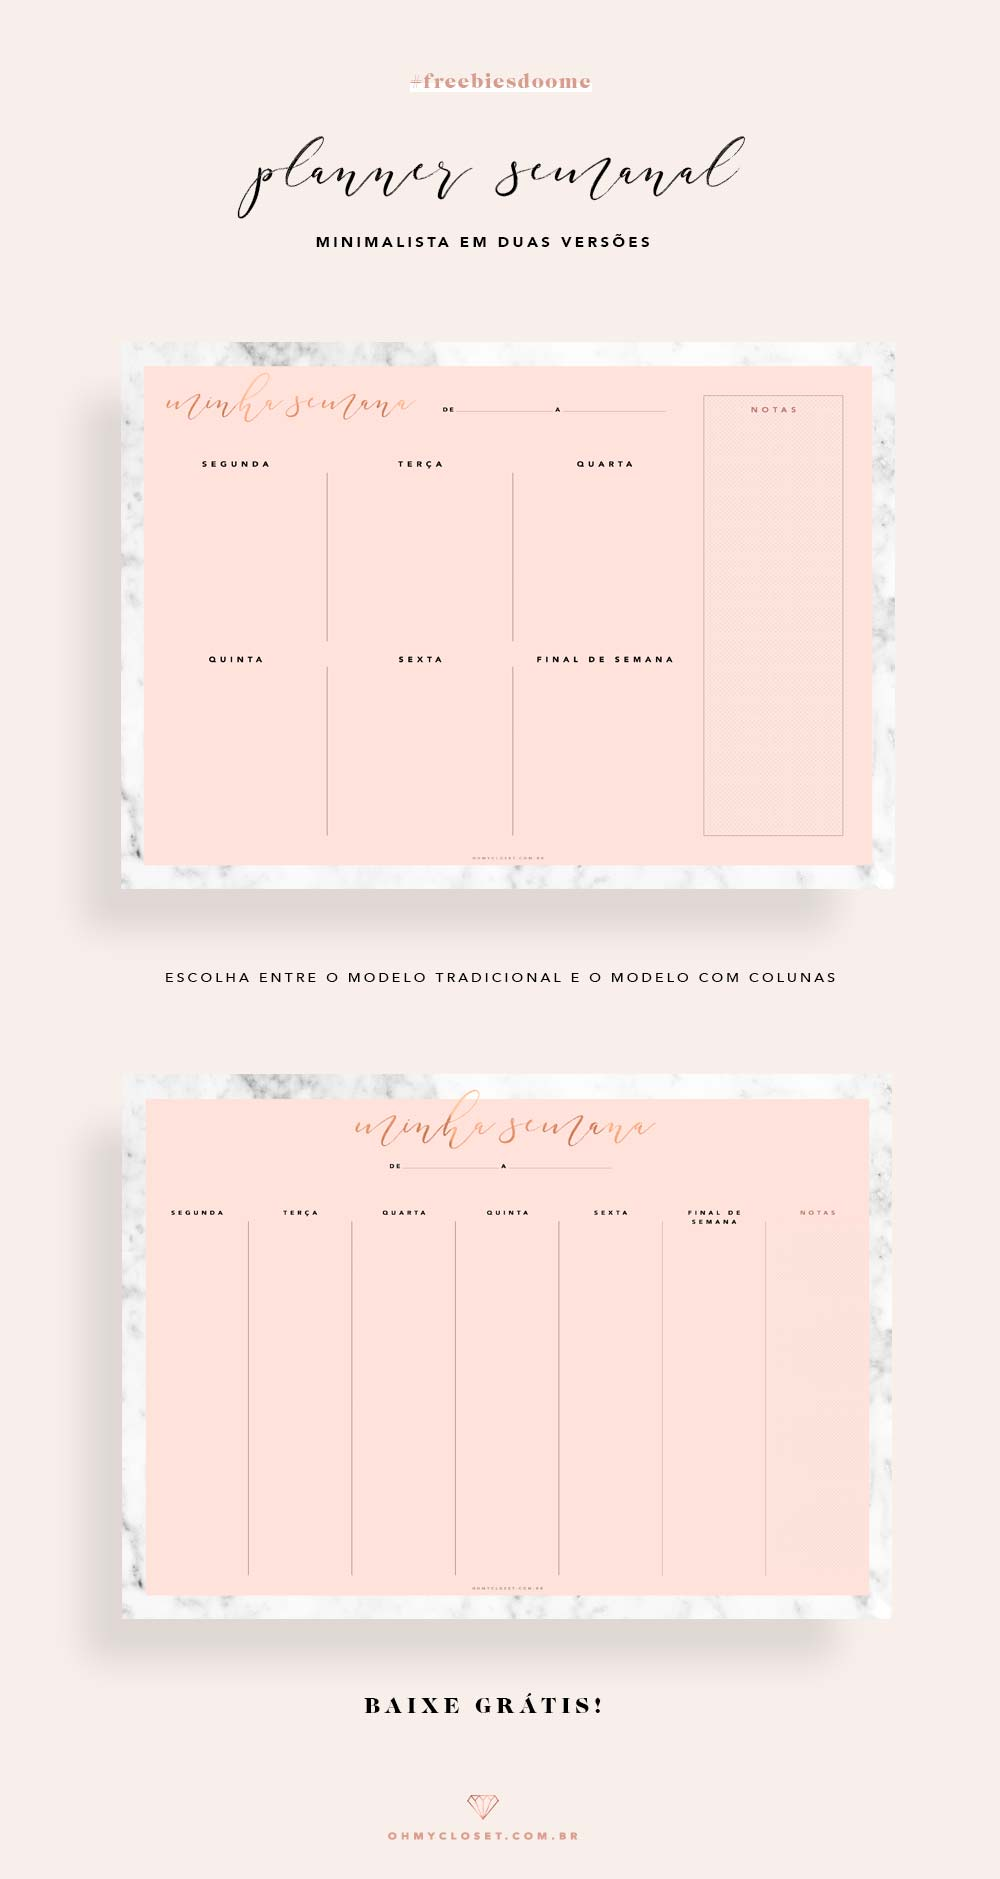 Planner semanal minimalista 2018 rosa e mármore grátis para imprimir.